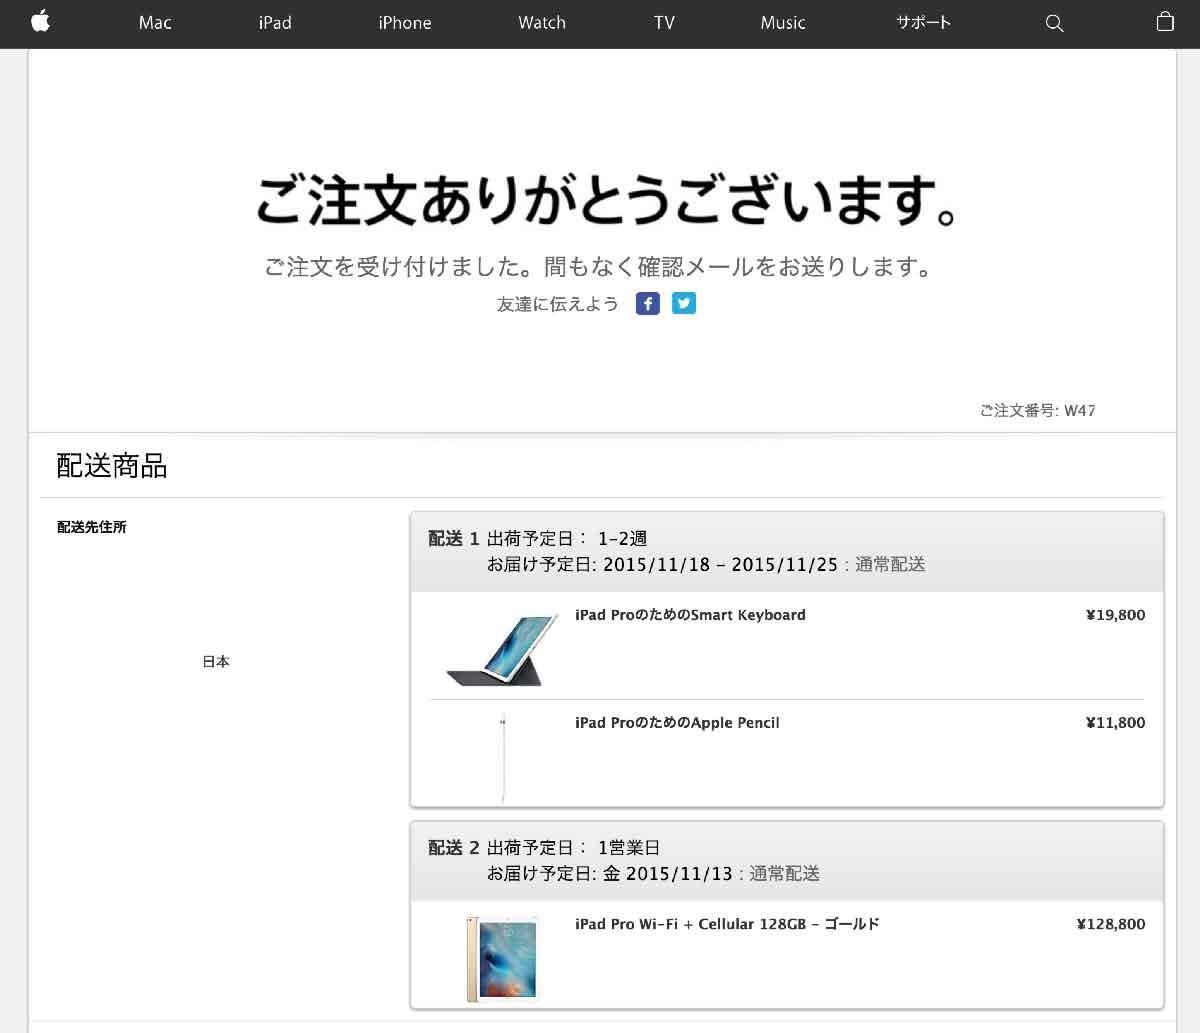 iPad Pro、Apple Pencil、Smart Keyboard購入完了画面